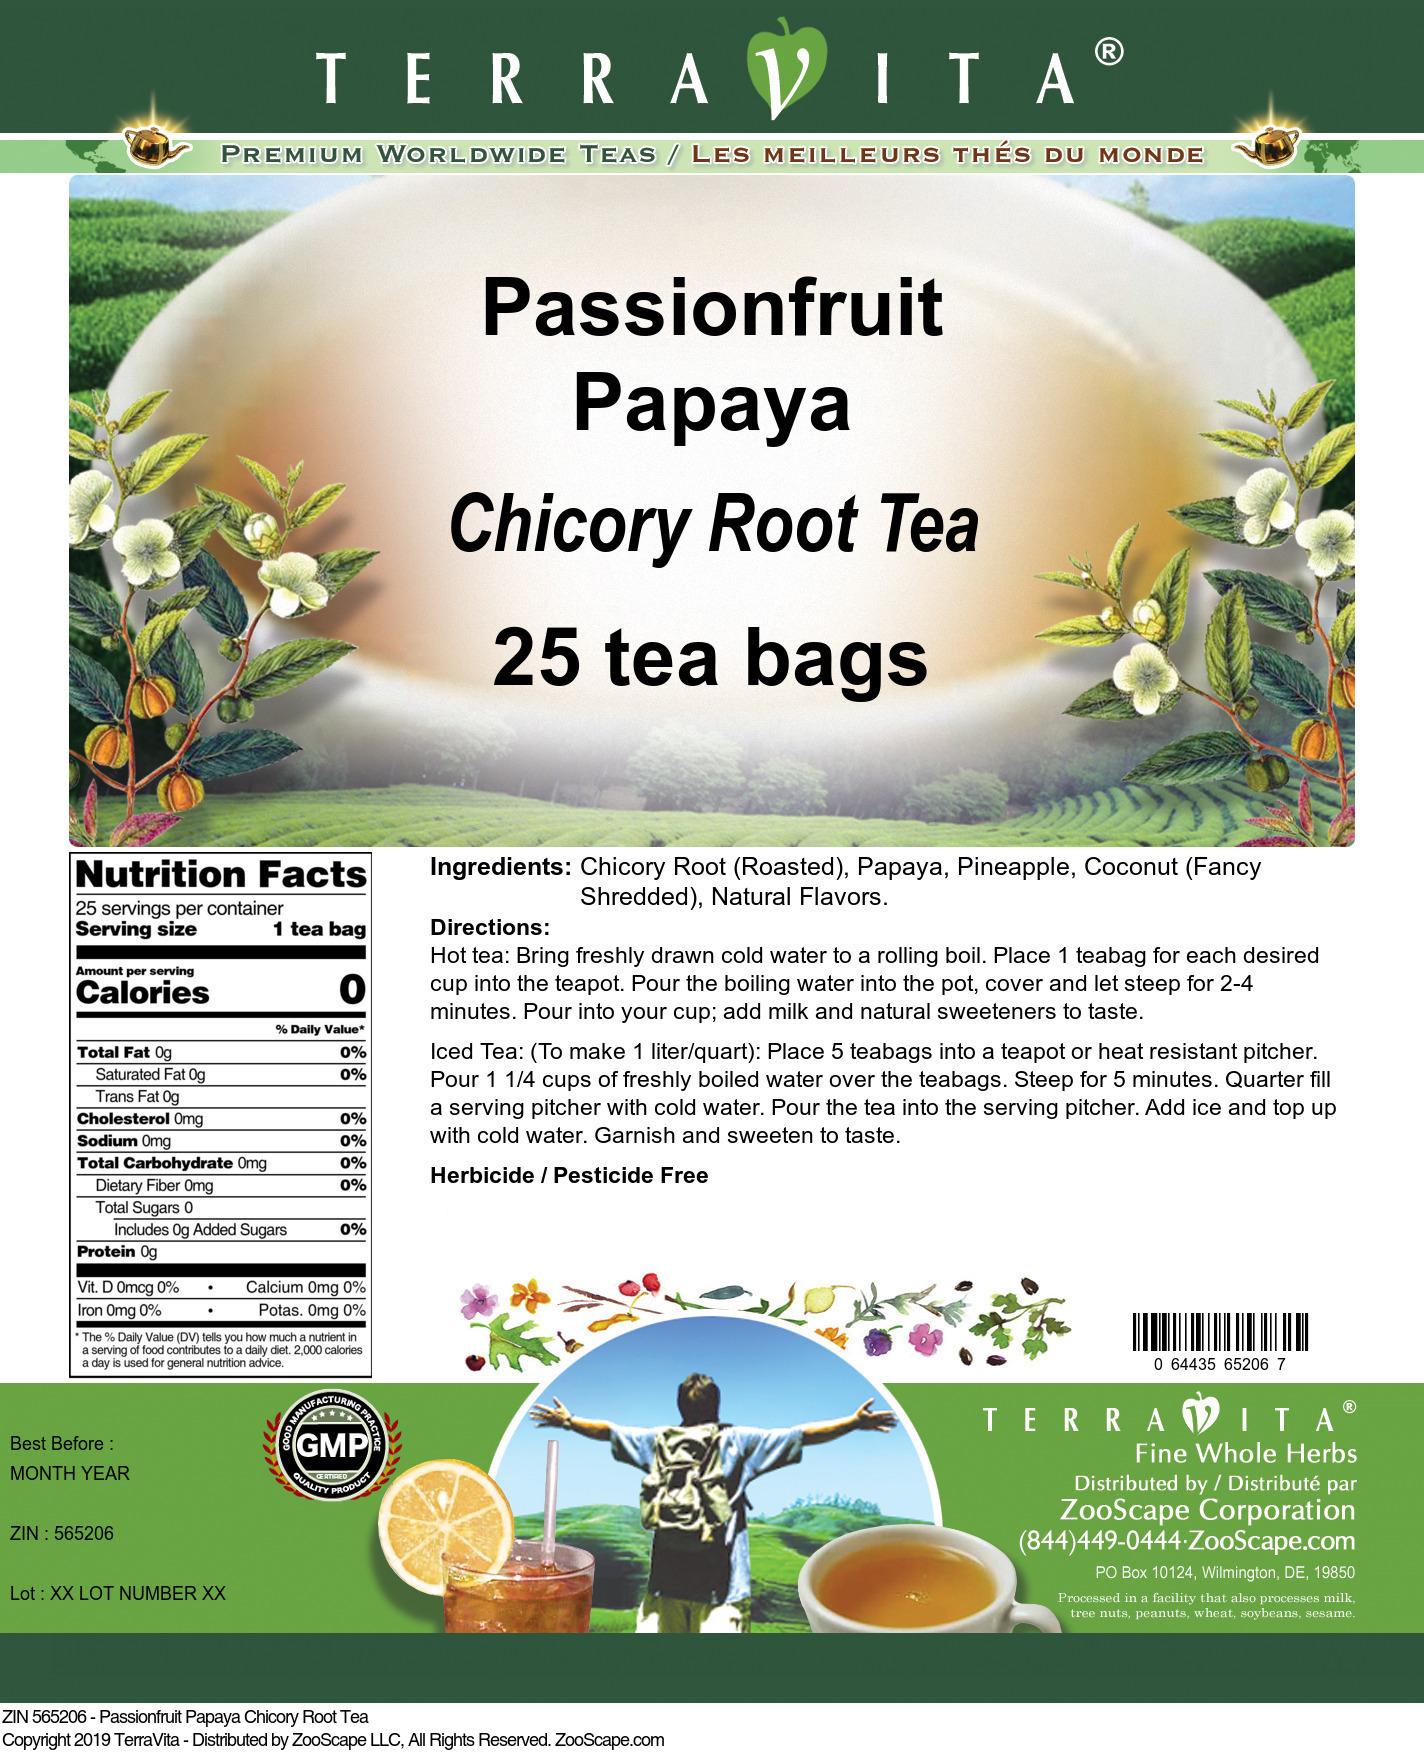 Passionfruit Papaya Chicory Root Tea